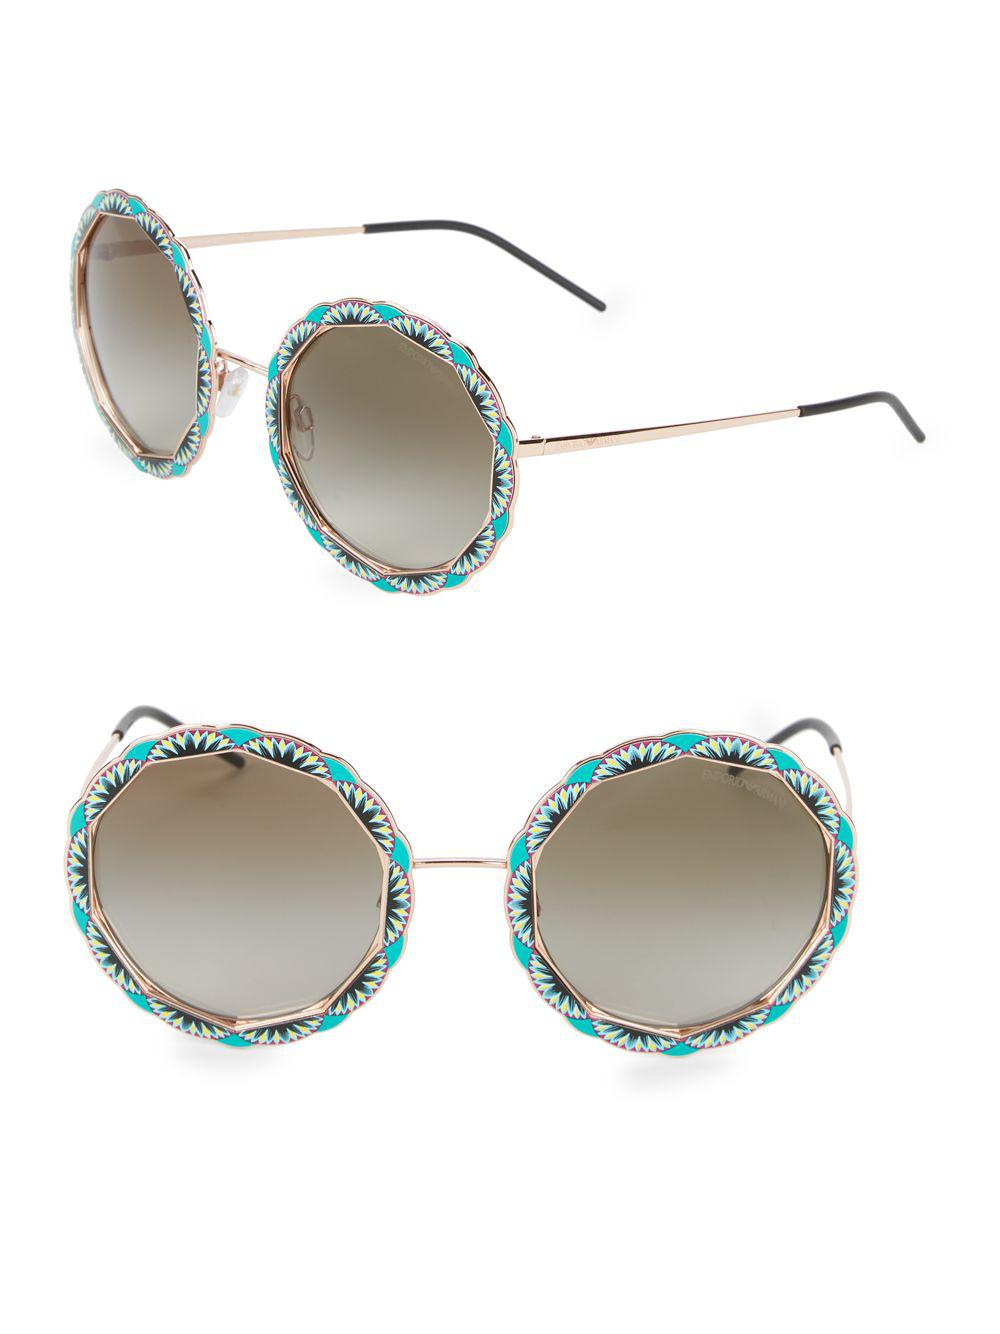 4565ac29682 Emporio Armani Ea2054 55mm Round Sunglasses in Metallic - Lyst